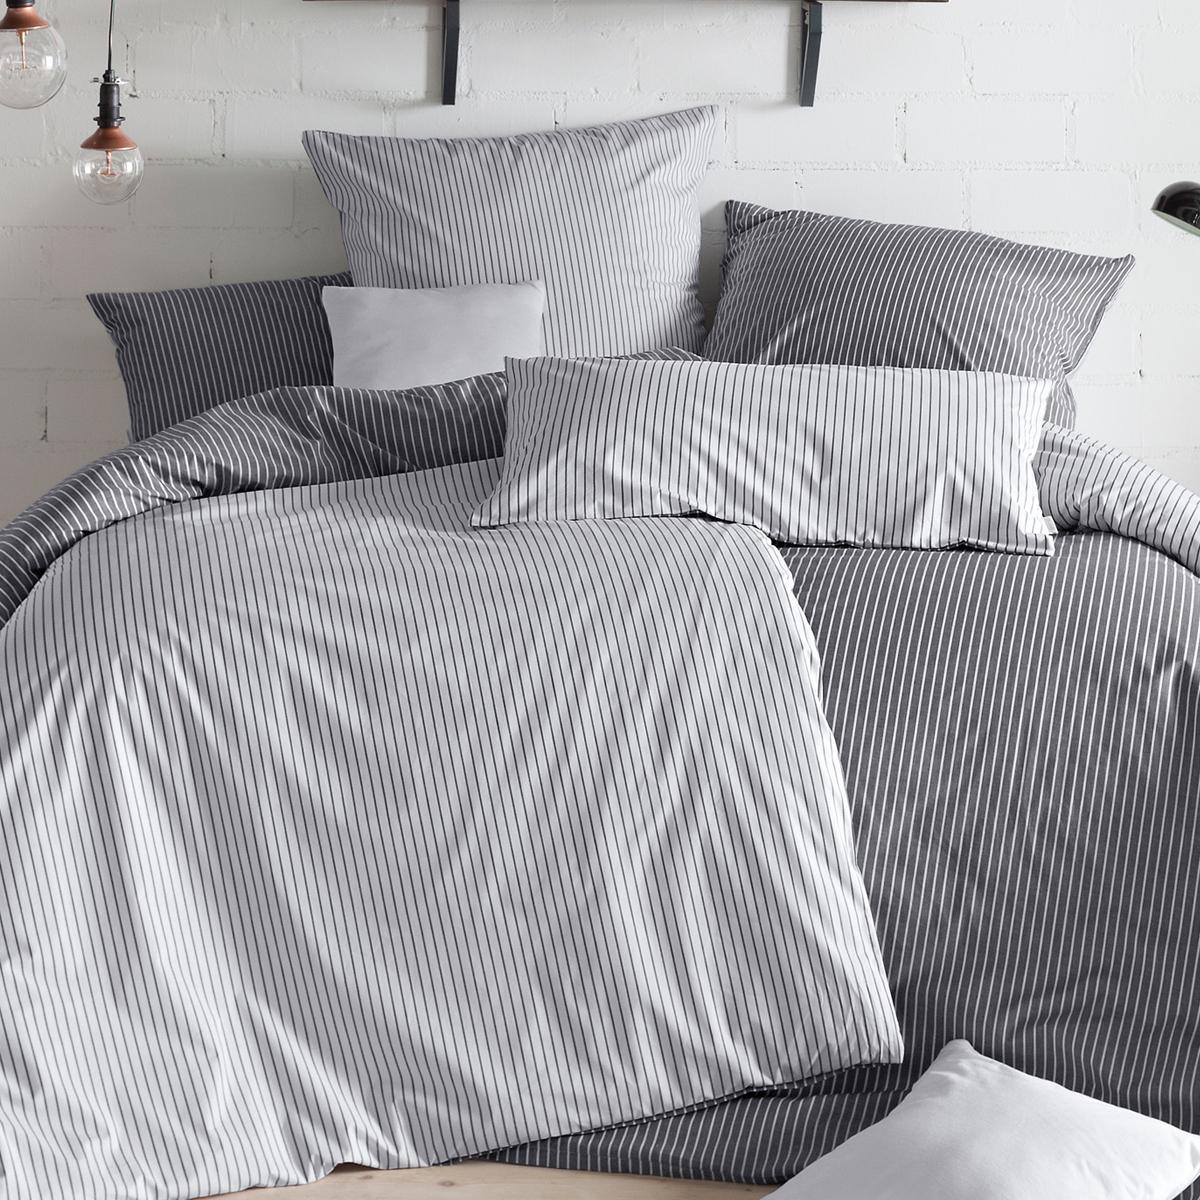 estella mako perkal bettw sche ronda 2250 905 schiefer. Black Bedroom Furniture Sets. Home Design Ideas